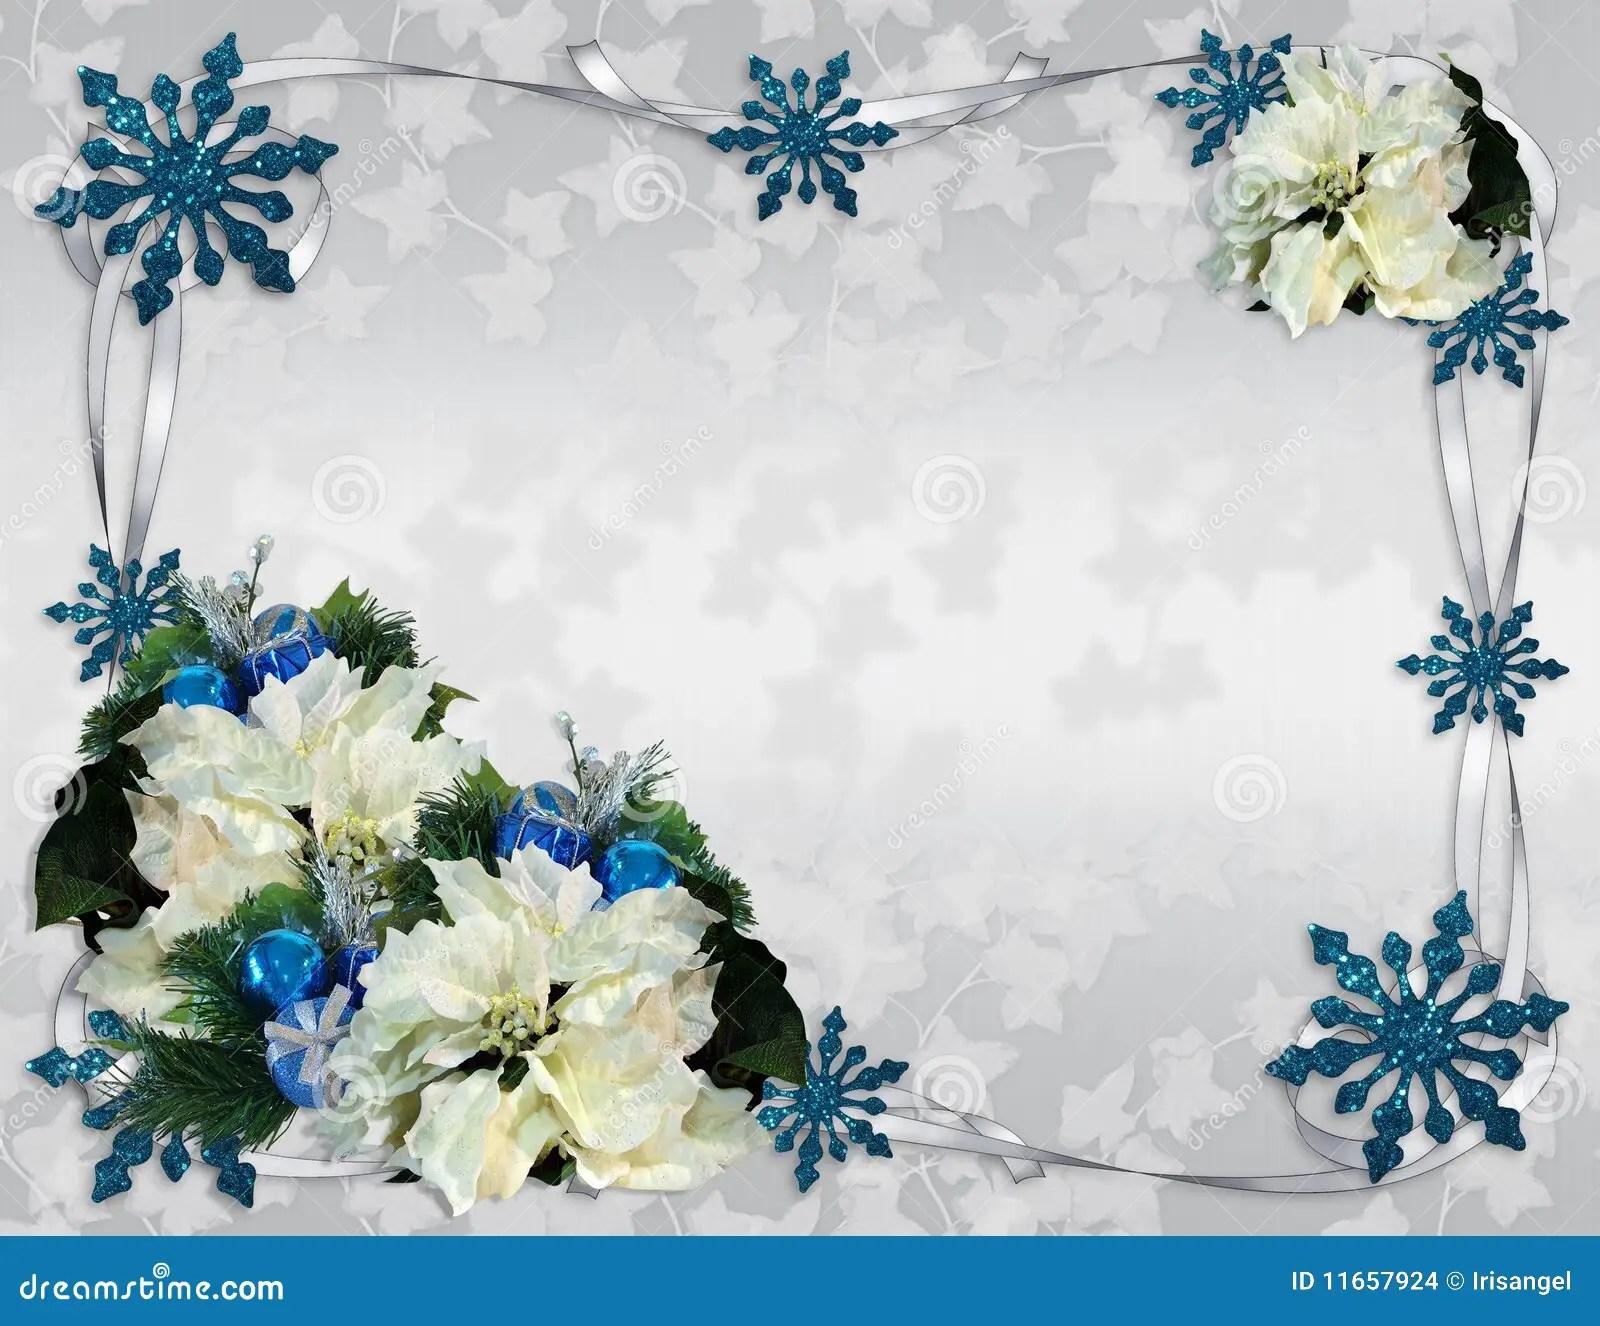 Christmas Border Poinsettias Elegant Stock Images Image